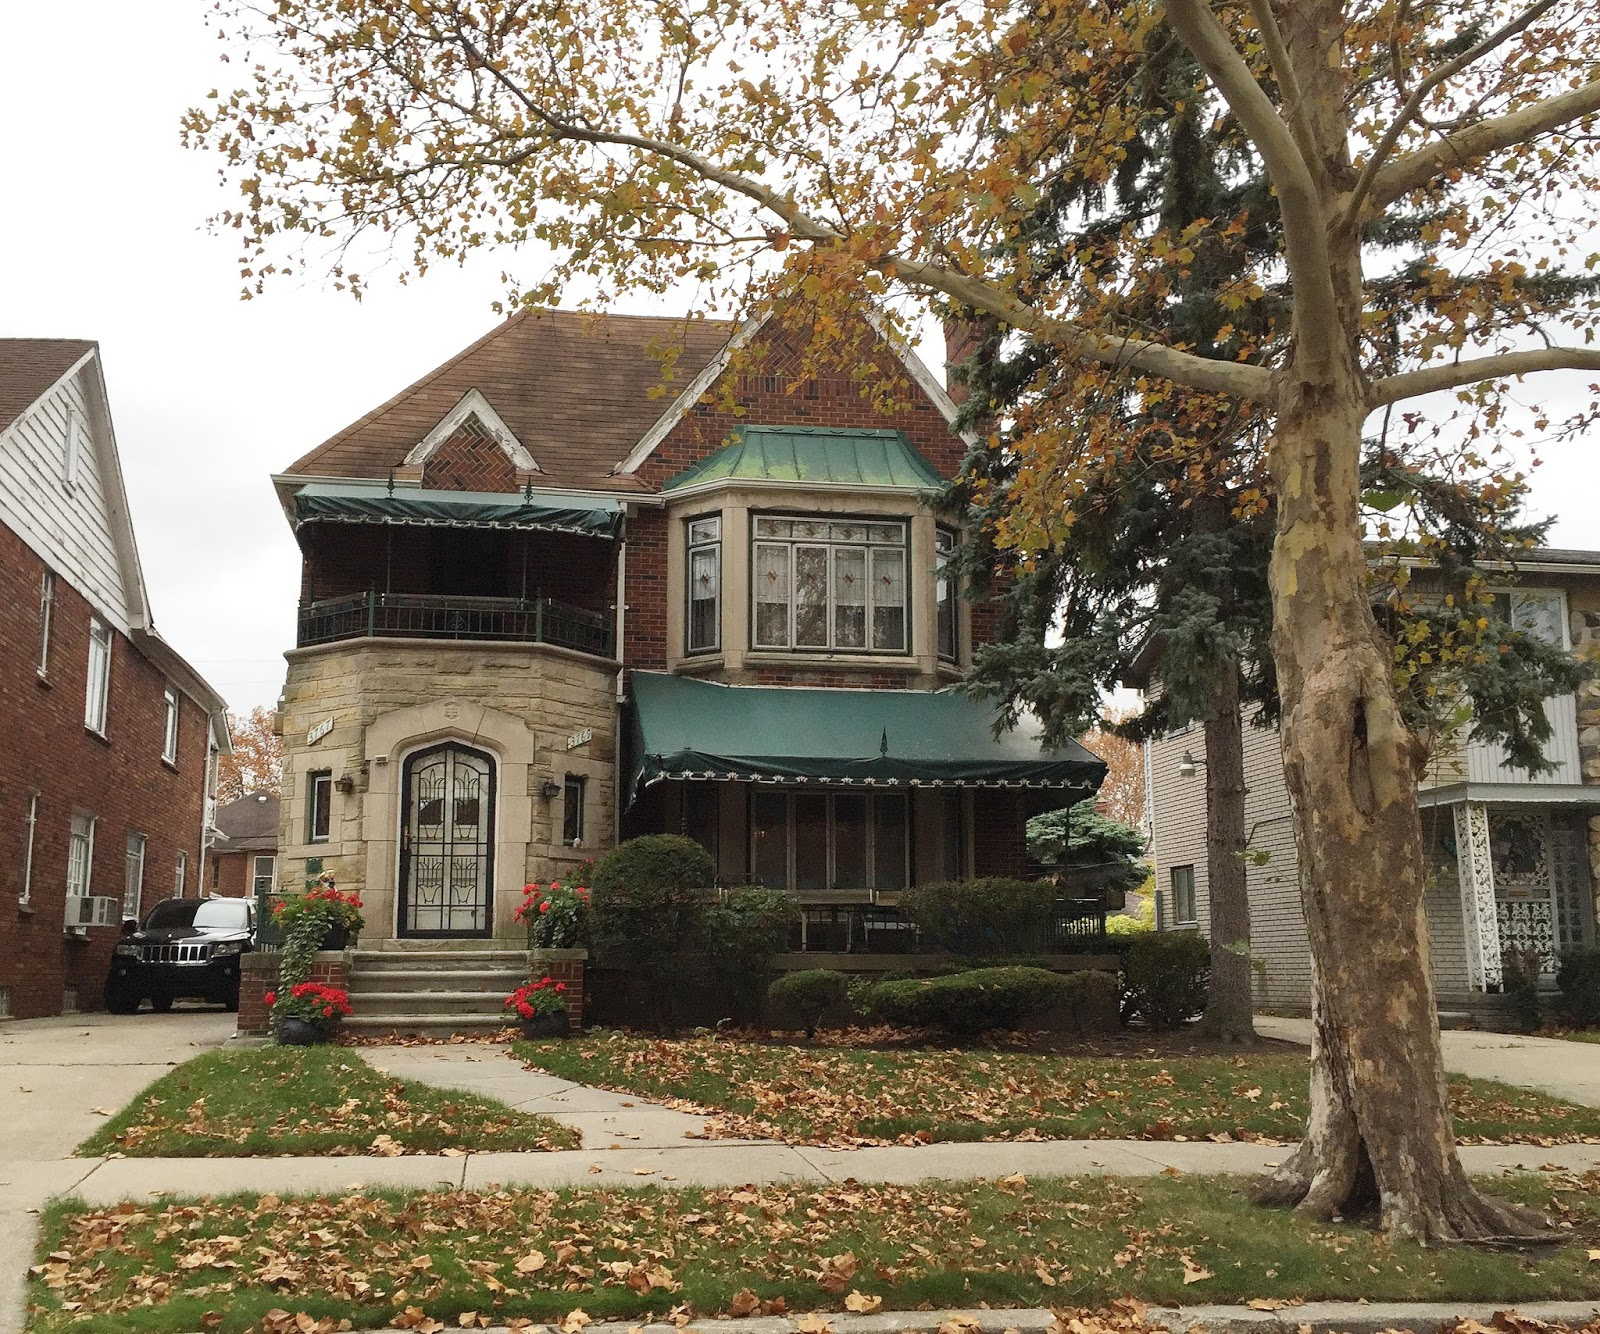 Entertaining views from cincinnati 48 hours in detroit for Ballard house